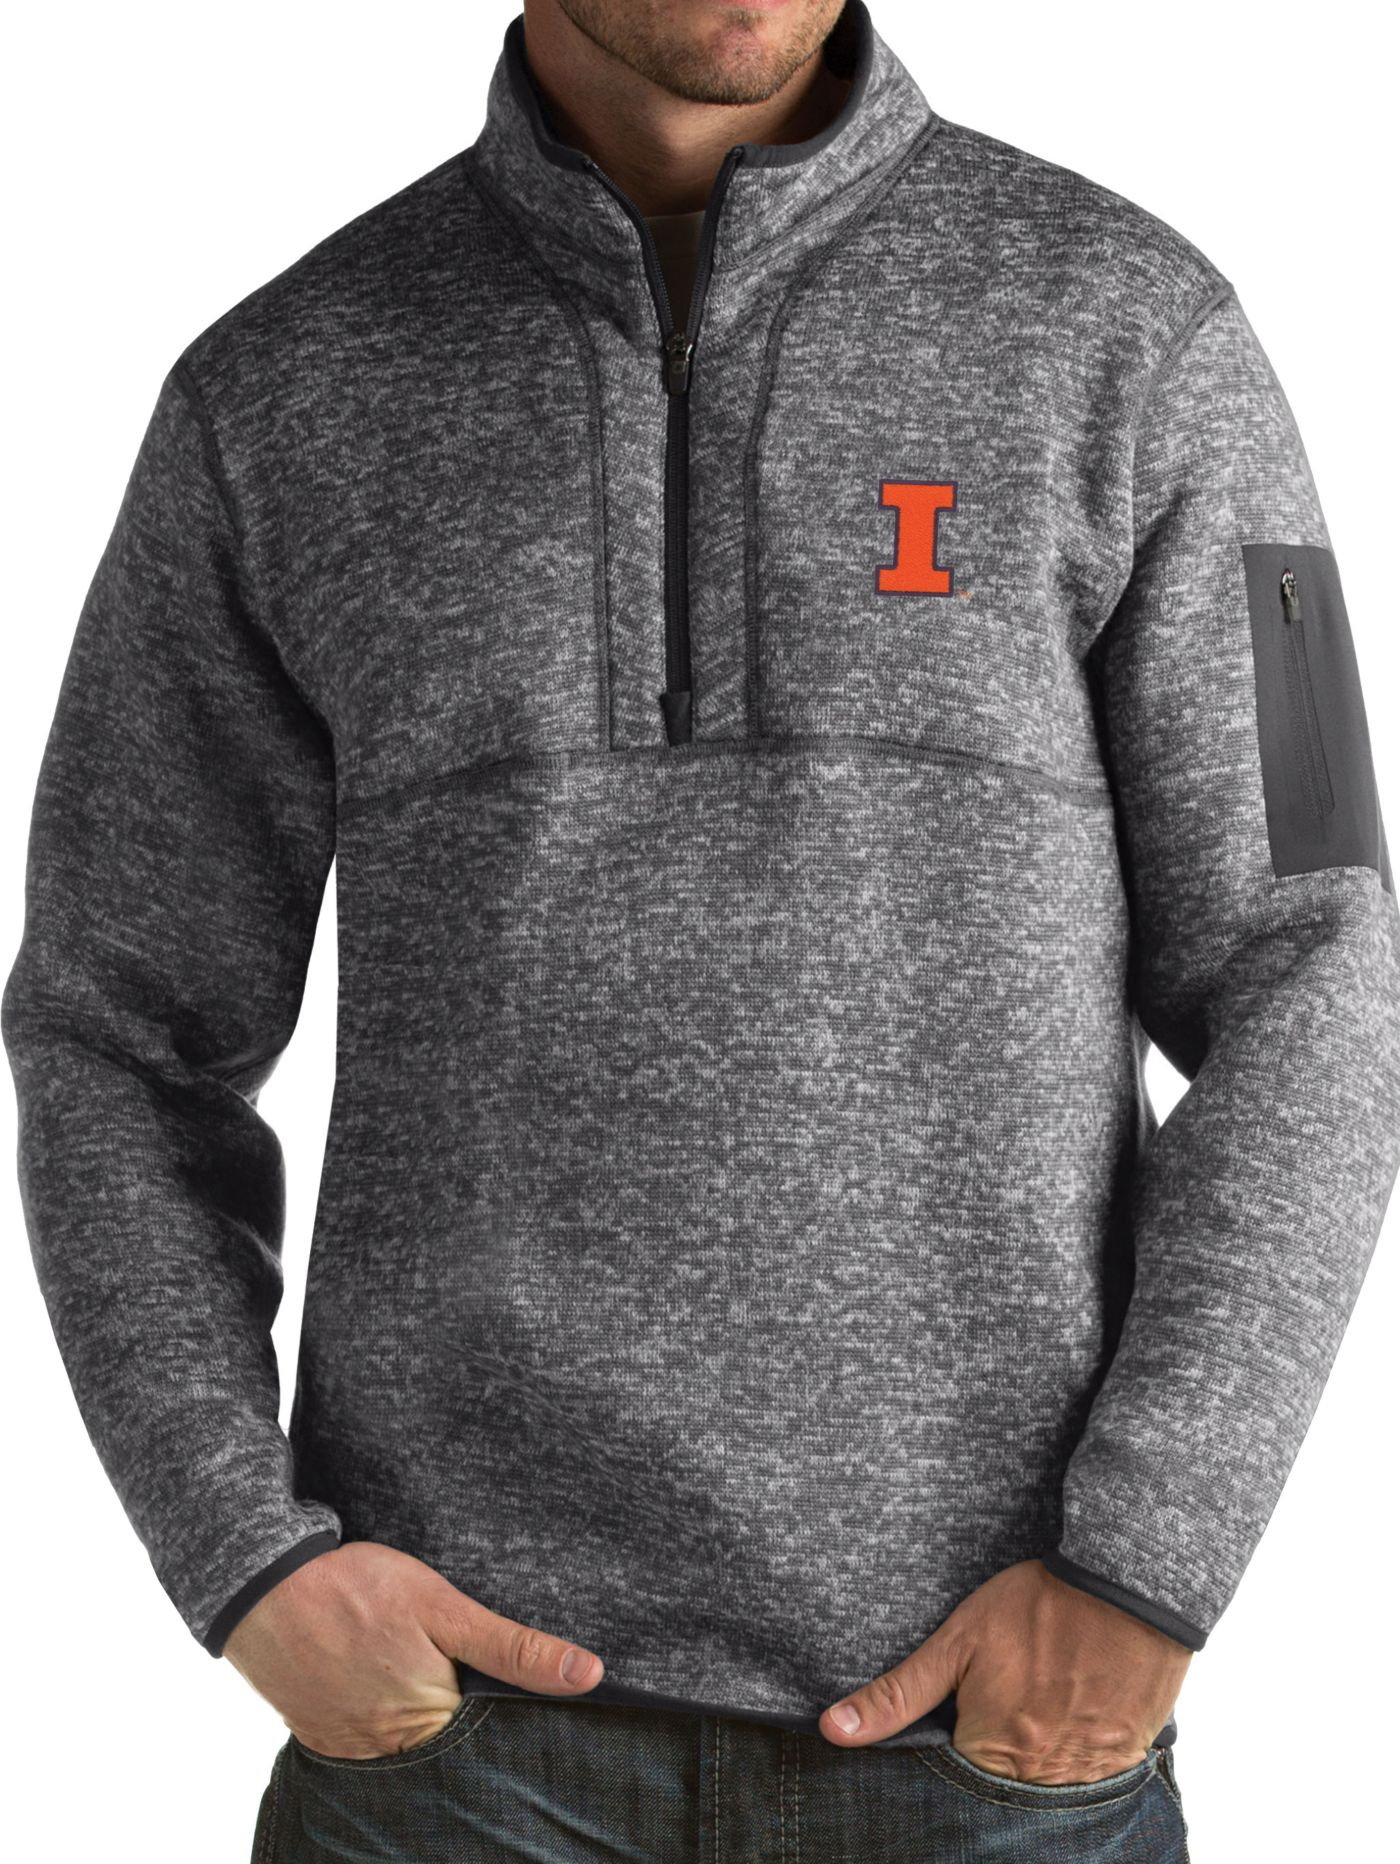 Antigua Men's Illinois Fighting Illini Grey Fortune Pullover Jacket